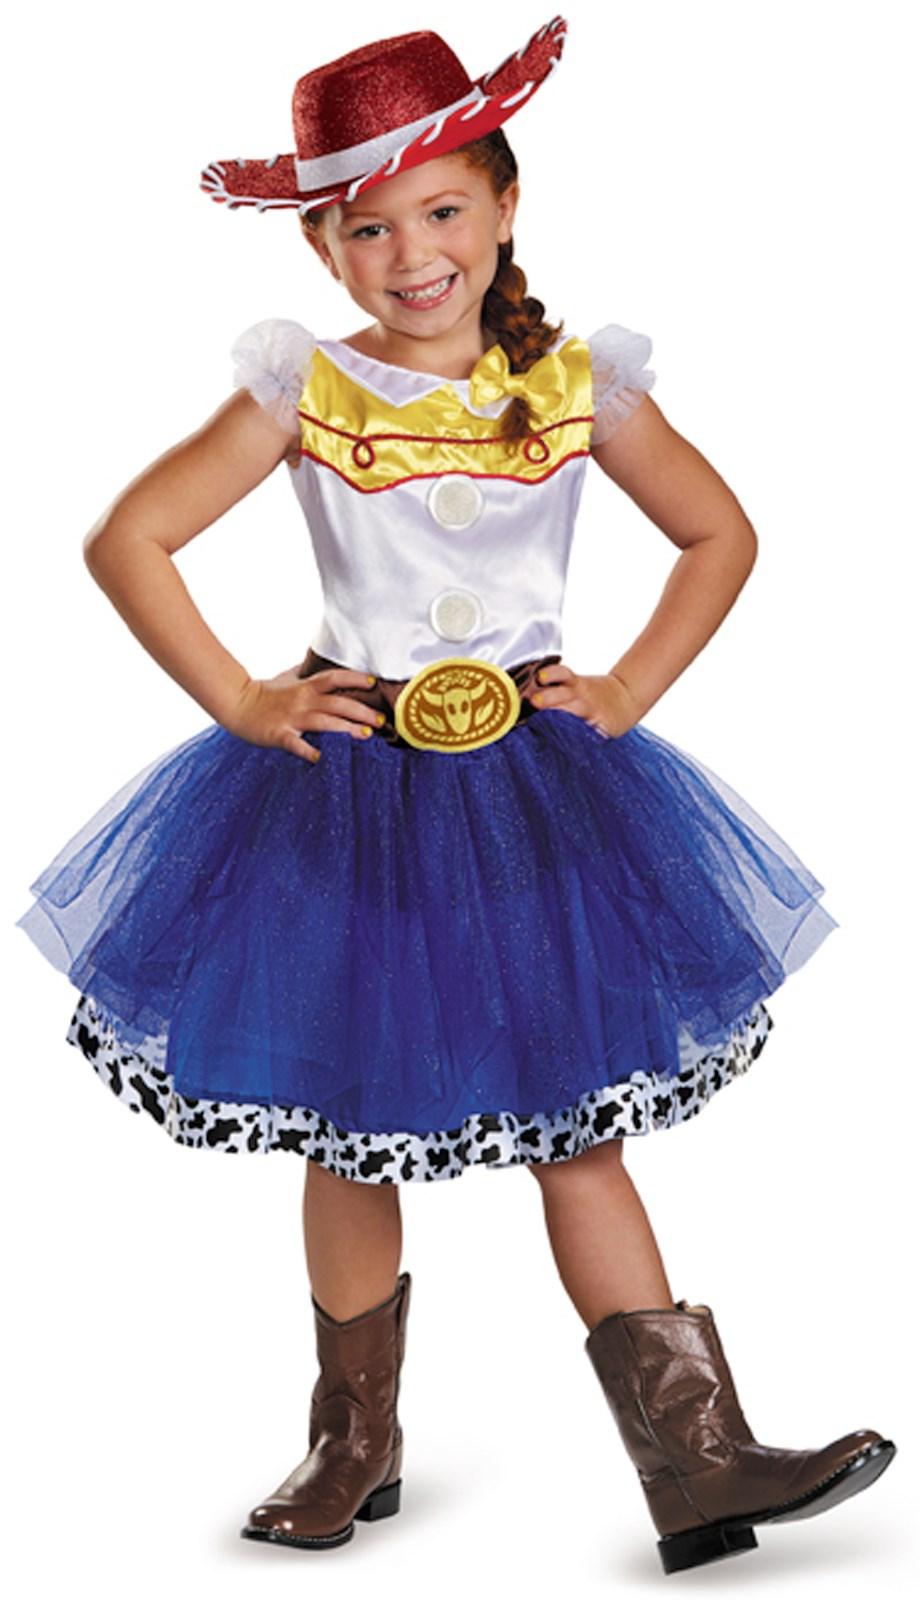 Toy Story Prestige Toddler Jessie Tutu Costume